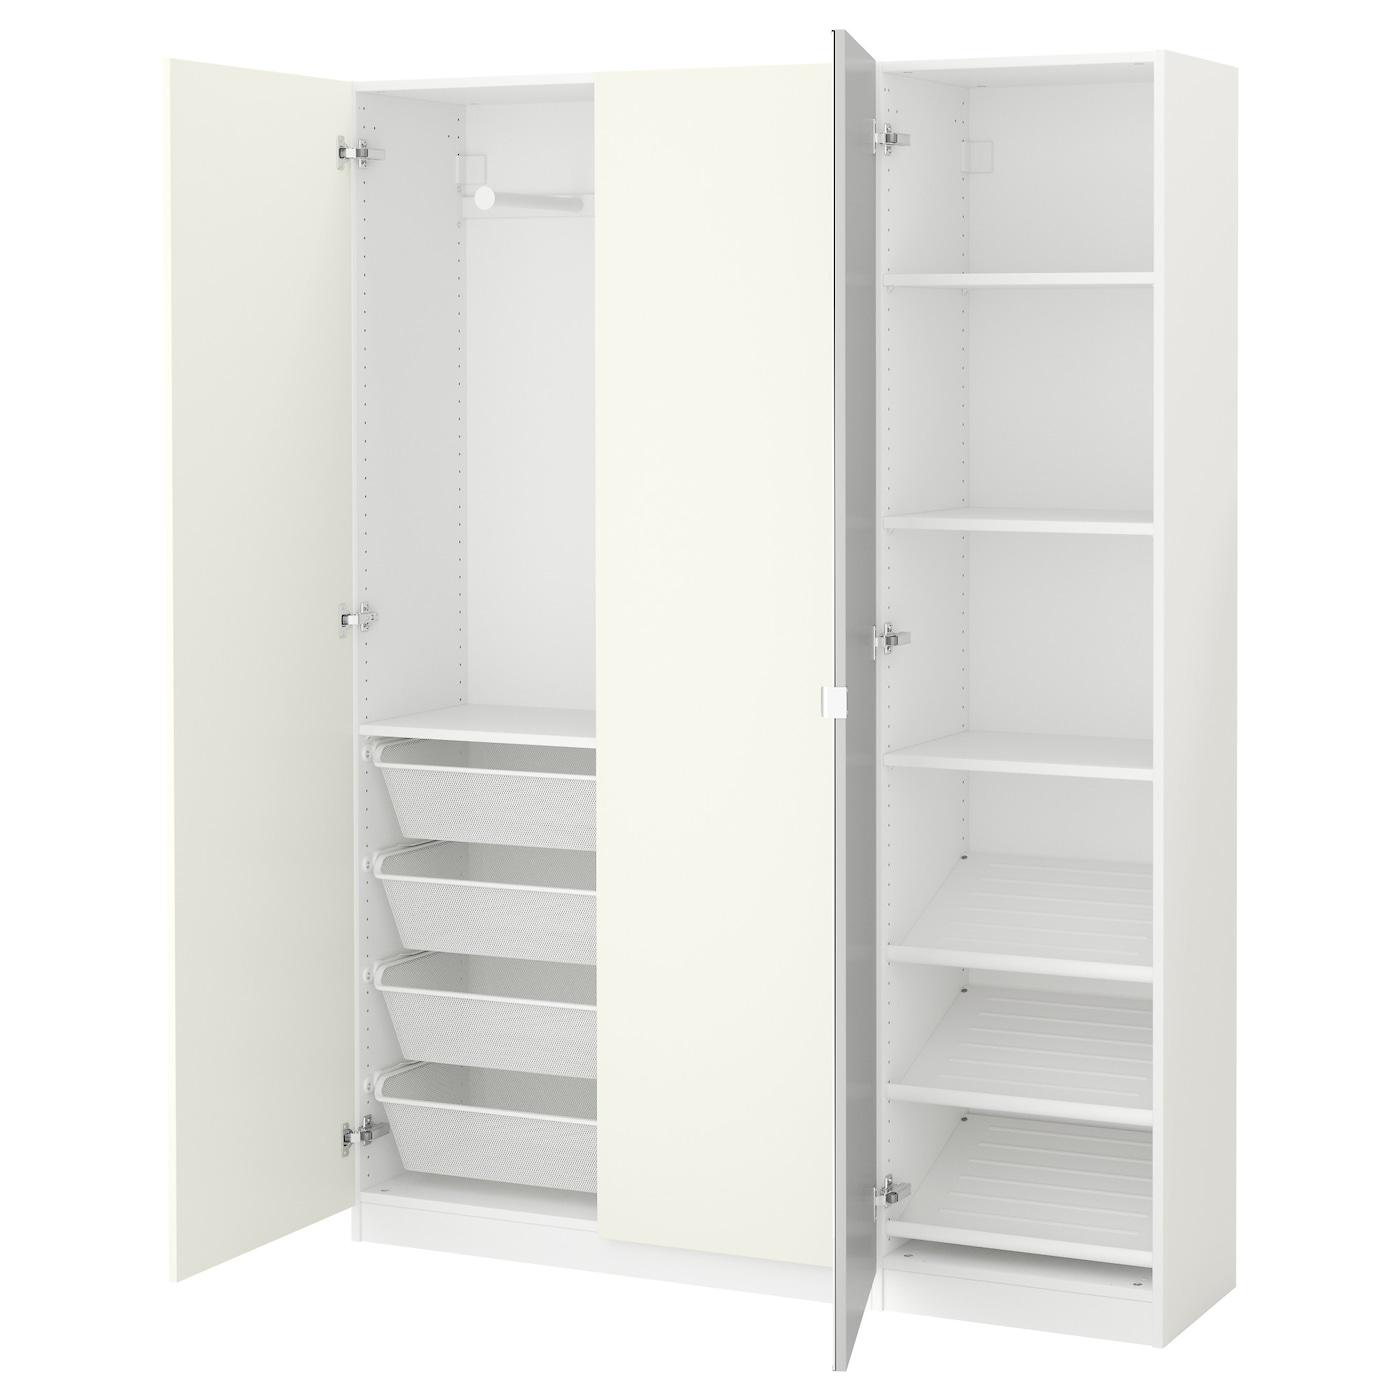 pax kledingkast wit tanem vikedal 150x38x201 cm ikea. Black Bedroom Furniture Sets. Home Design Ideas